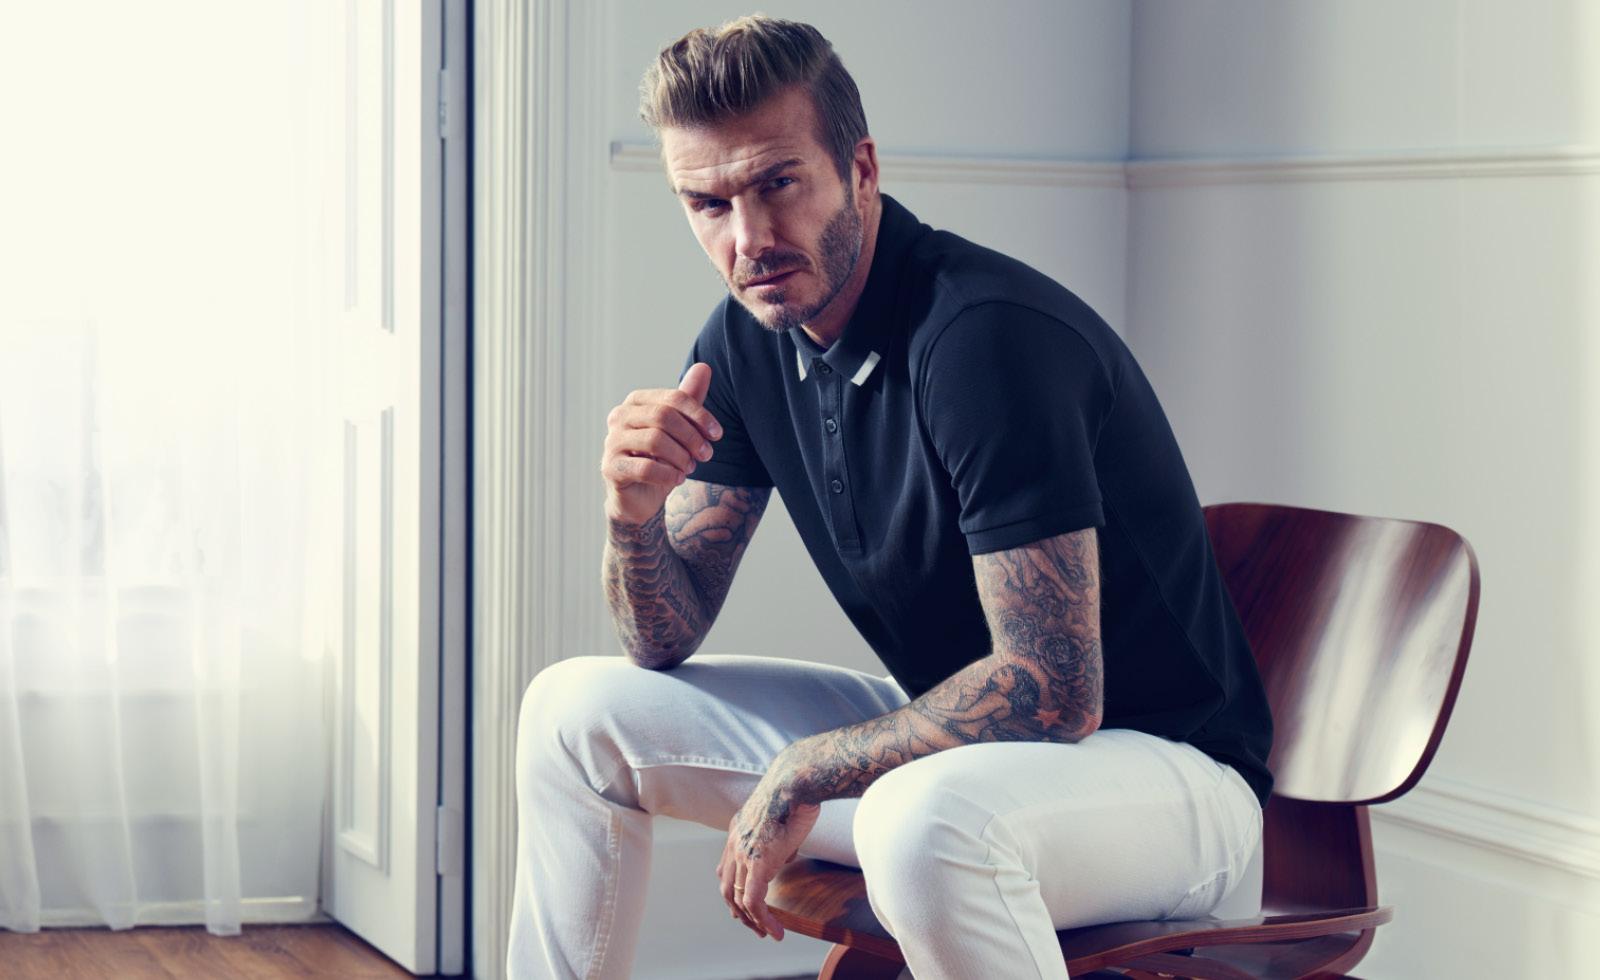 Îmbracă-te ca David Beckham!